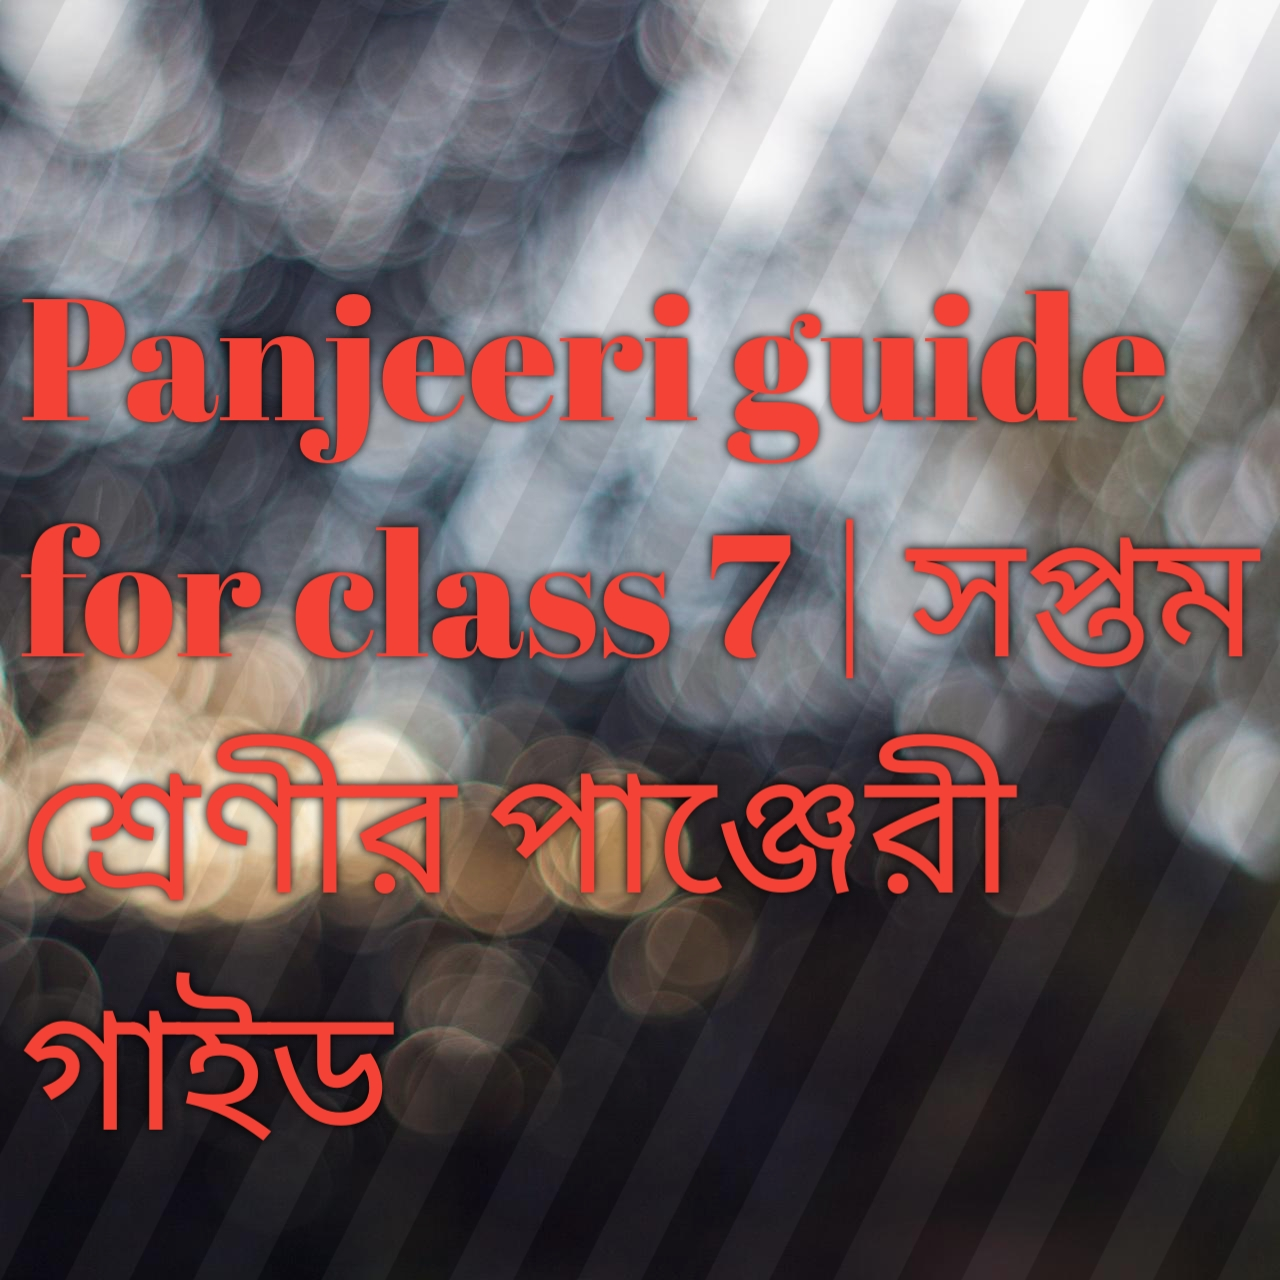 class 7 panjeeree guide 2021, class 7 panjeeree guide pdf, class 7 panjeeree guide book 2021, class 7 math solution panjeeree guide, panjeeree guide class 7, panjeeree guide for class 7, panjeeree guide for class 7 english, panjeeree guide for class 7 math, panjeeree guide for class 7 science, panjeeree guide for class 7 Bangladesh and global studies, panjeeree guide for class panjeeree guide for class 7 hindu dharma, panjeeree guide for class 7 ICT, panjeeree guide for class 7 home science, panjeeree guide for class 7 agriculture education, panjeeree guide for class physical education, সপ্তম শ্রেণীর বাংলা গাইড পাঞ্জেরি ডাউনলোড, সপ্তম শ্রেণীর বাংলা গাইড এর পিডিএফ, সপ্তম শ্রেণির বাংলা পাঞ্জেরি গাইড পিডিএফ ২০২১, সপ্তম শ্রেণীর পাঞ্জেরি গাইড ২০২১, সপ্তম শ্রেণির ইংরেজি পাঞ্জেরি গাইড, সপ্তম শ্রেণীর গণিত পাঞ্জেরি গাইড, সপ্তম শ্রেণীর পাঞ্জেরি গাইড বিজ্ঞান, শ্রেণীর পাঞ্জেরি গাইড বাংলাদেশ ও বিশ্বপরিচয়, সপ্তম শ্রেণীর পাঞ্জেরি গাইড ইসলাম শিক্ষা, সপ্তম শ্রেণীর পাঞ্জেরি গাইড হিন্দুধর্ম, সপ্তম শ্রেণীর পাঞ্জেরি গাইড গার্হস্থ্য বিজ্ঞান, সপ্তম শ্রেণীর পাঞ্জেরি গাইড কৃষি শিক্ষা, সপ্তম শ্রেণীর পাঞ্জেরি গাইড তথ্য যোগাযোগ প্রযুক্তি, সপ্তম শ্রেণীর পাঞ্জেরি গাইড শারীরিক শিক্ষা,